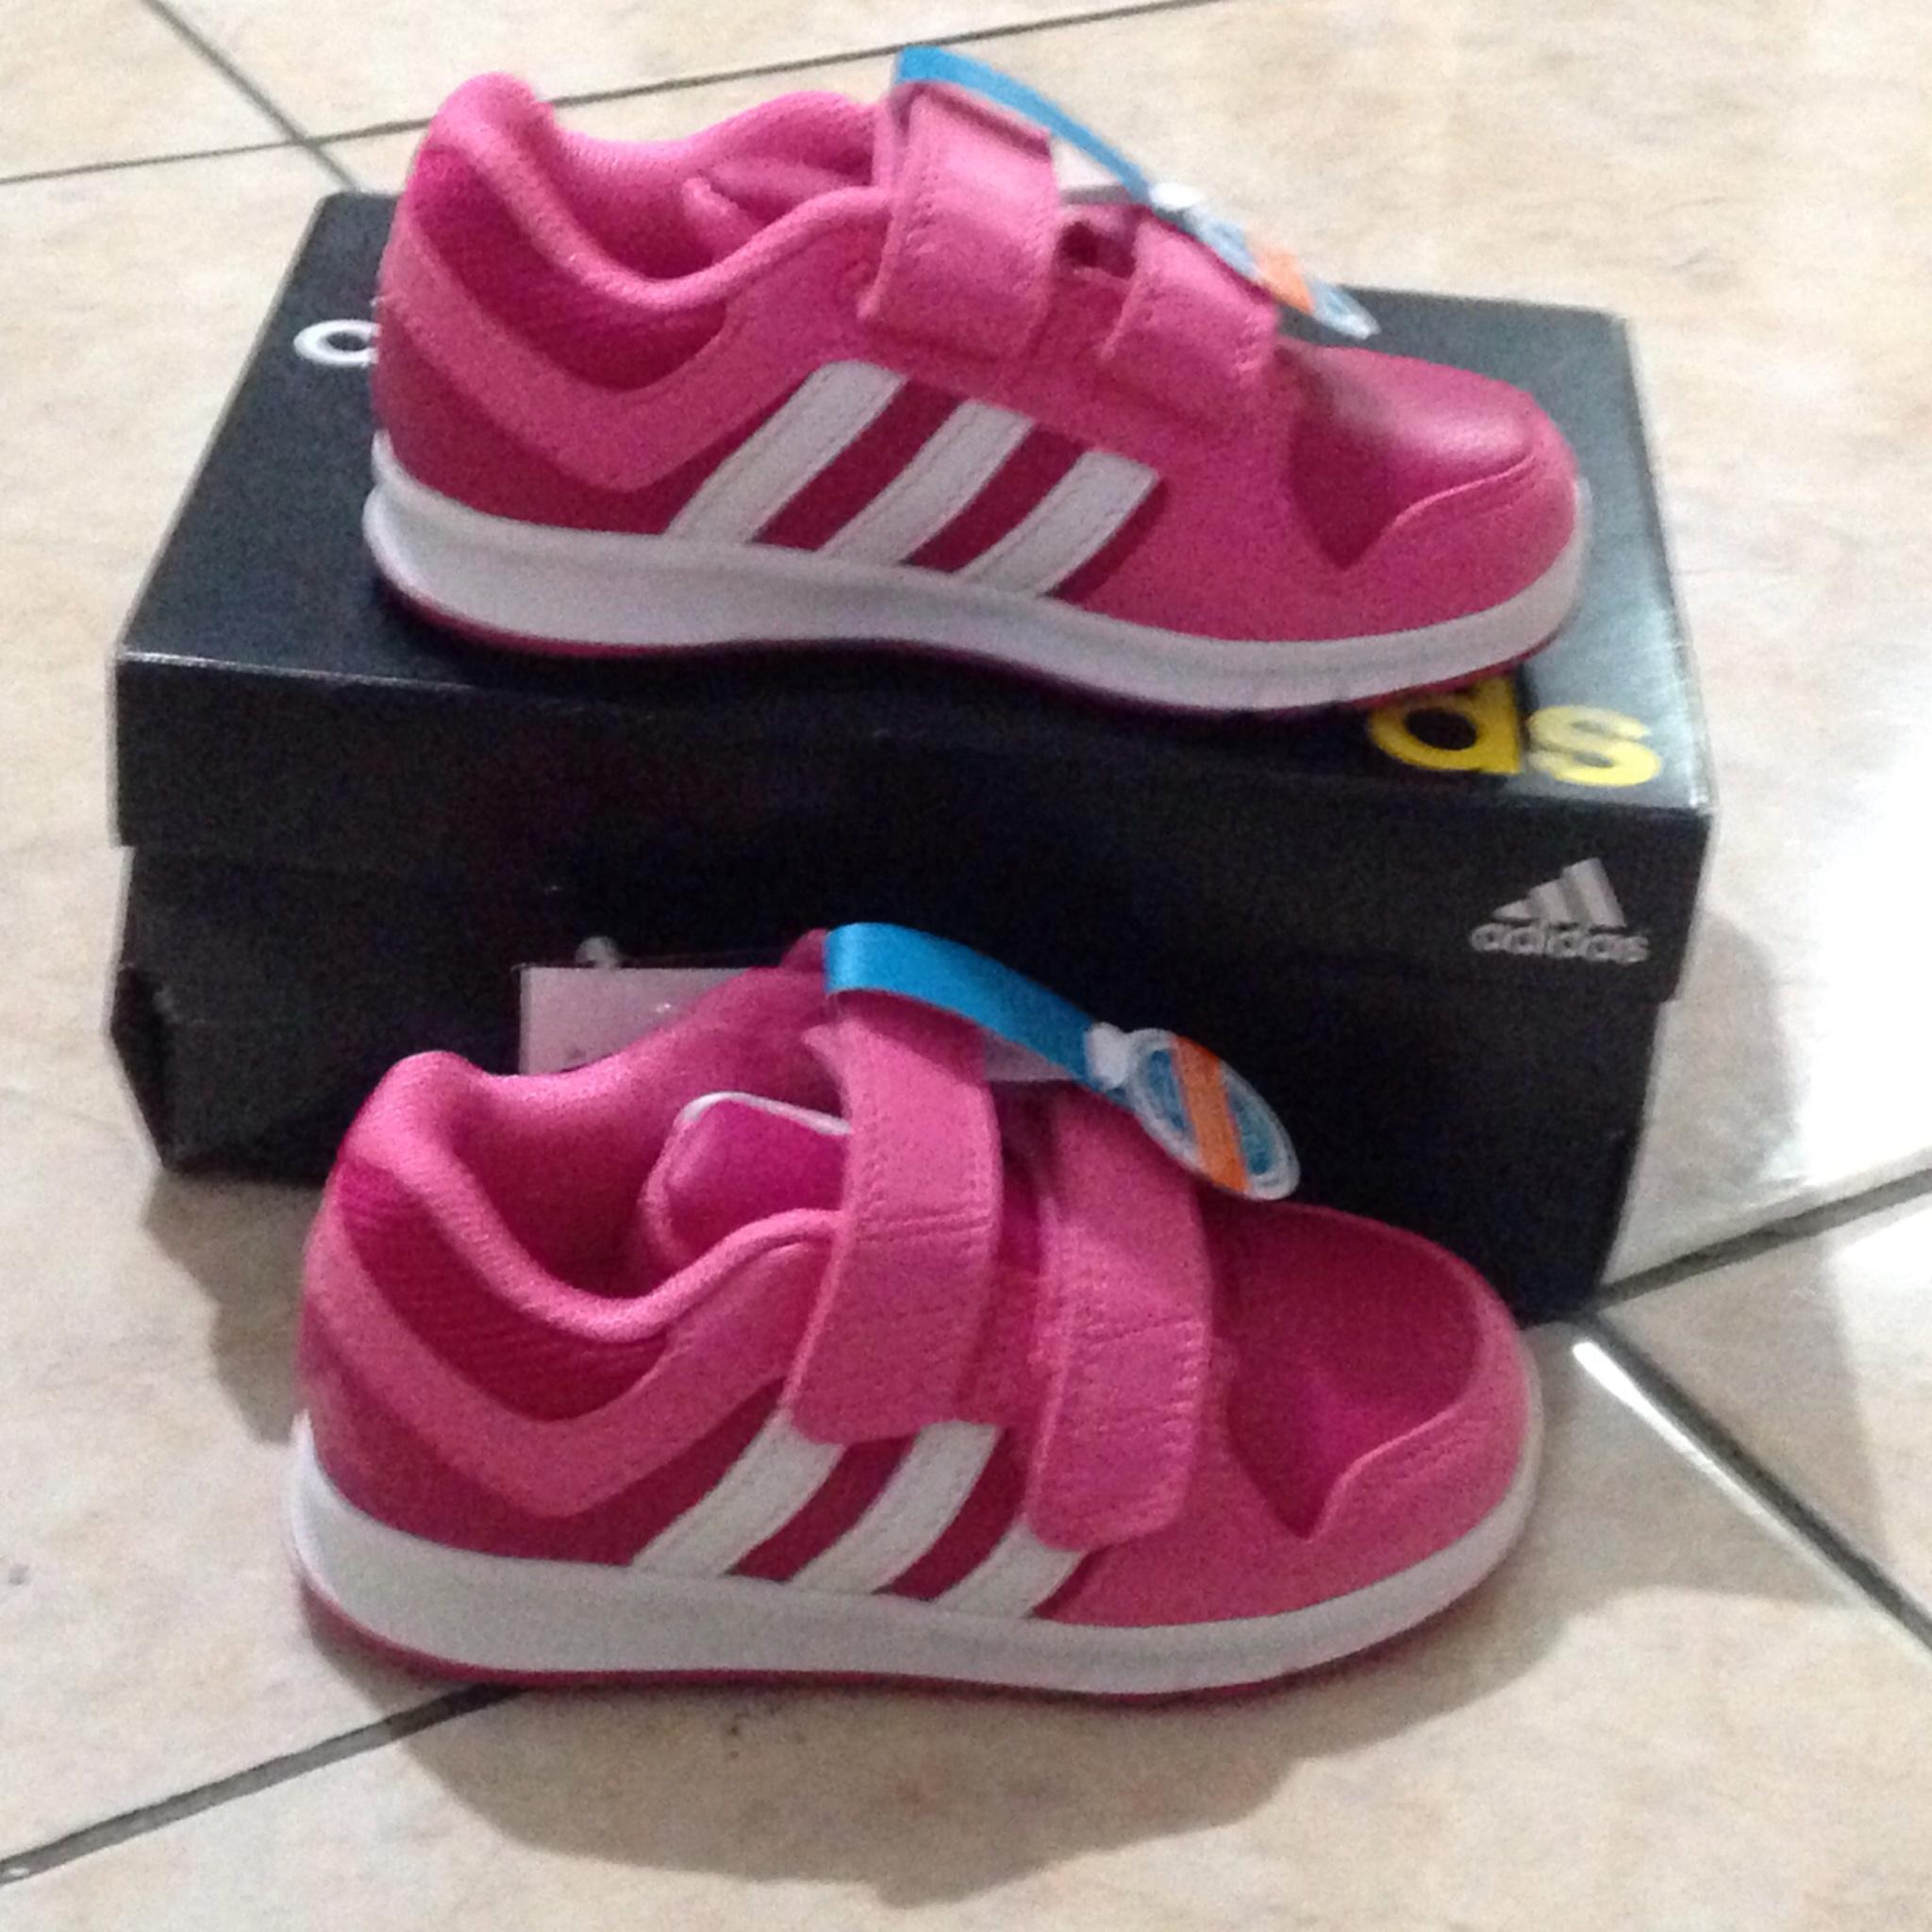 Jual Adidas Lk Trainer Infant Pink With Ortholite Size 25 Sepatu Spatu Anak Kets Sportsite Tokopedia